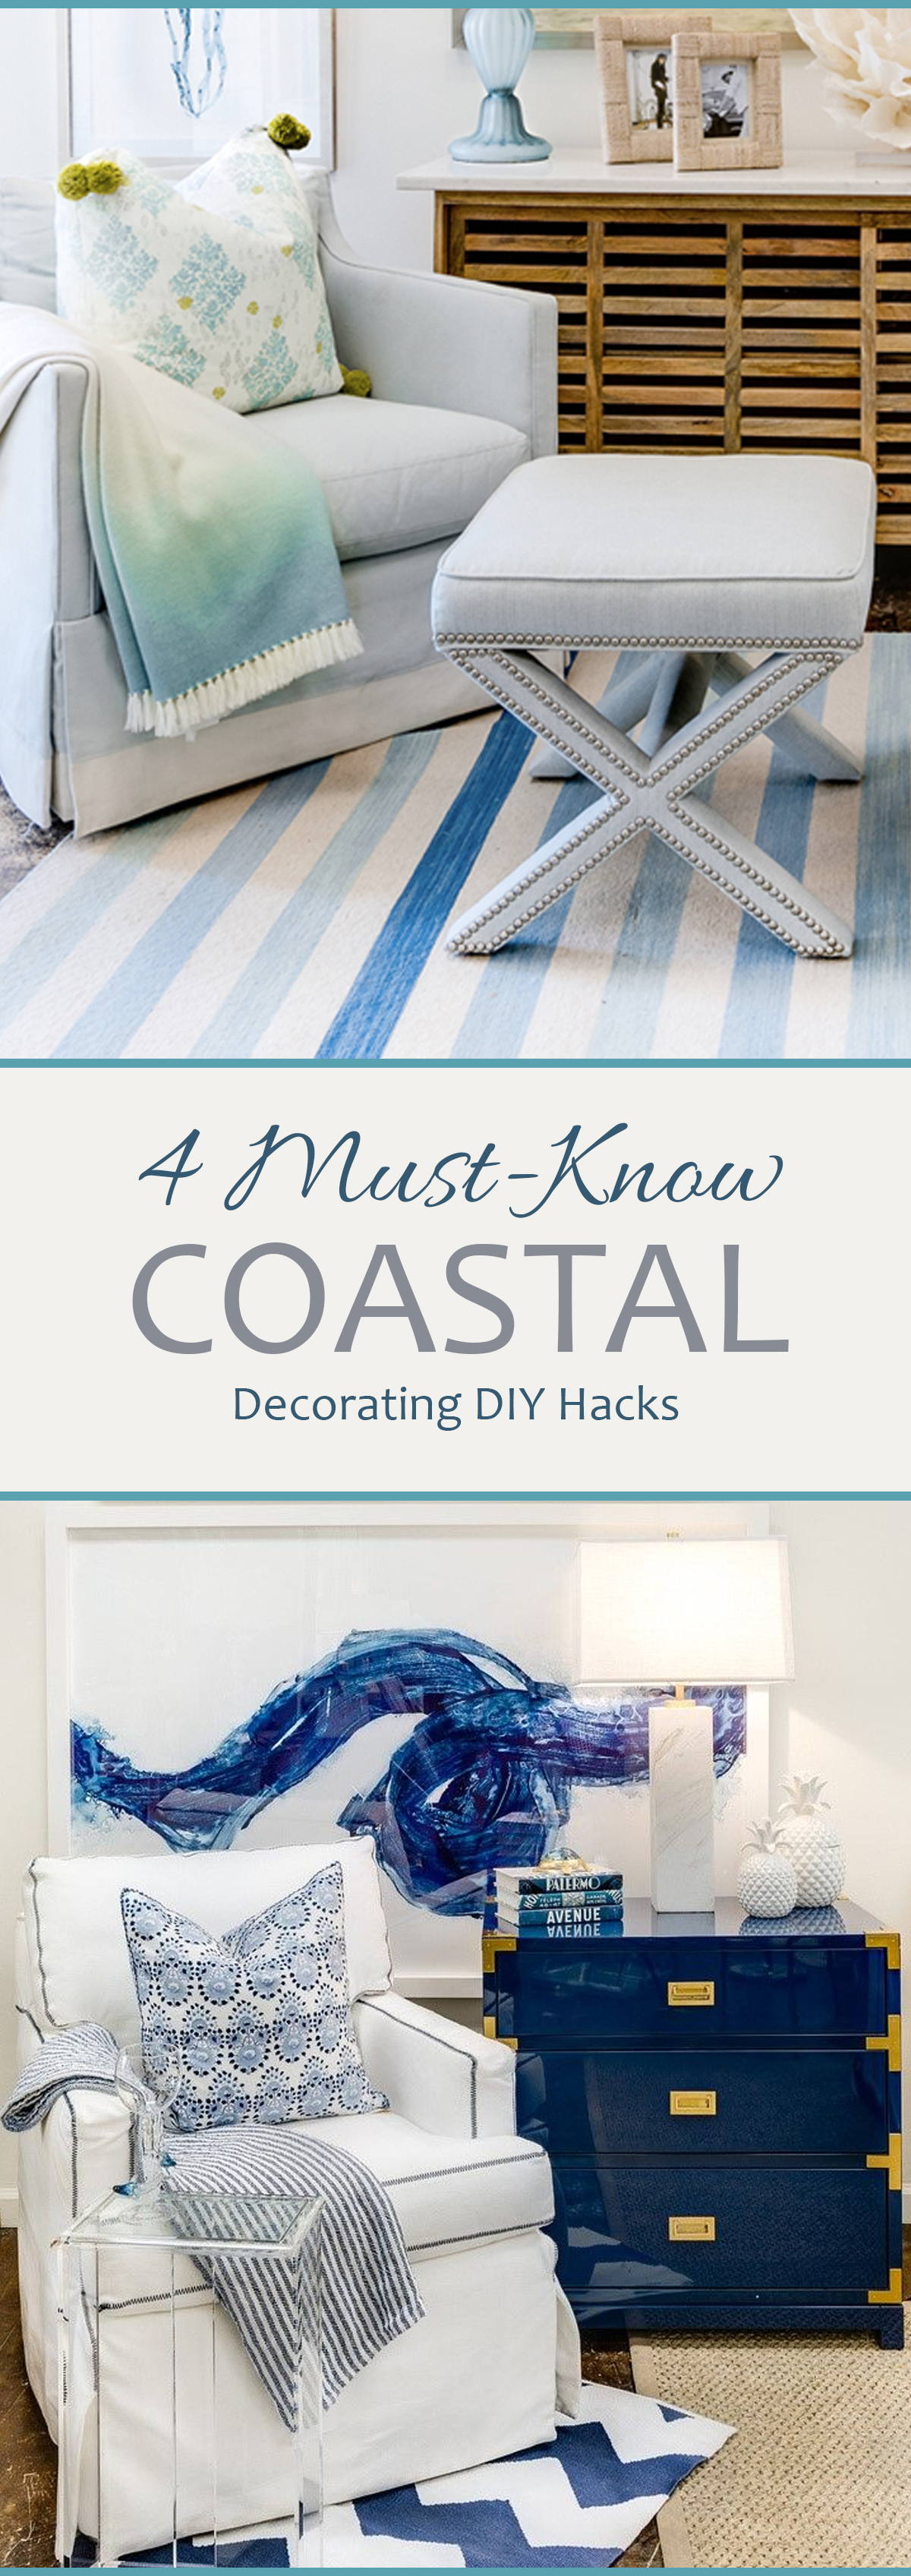 4-must-know-coastal-decorating-diy-hacks